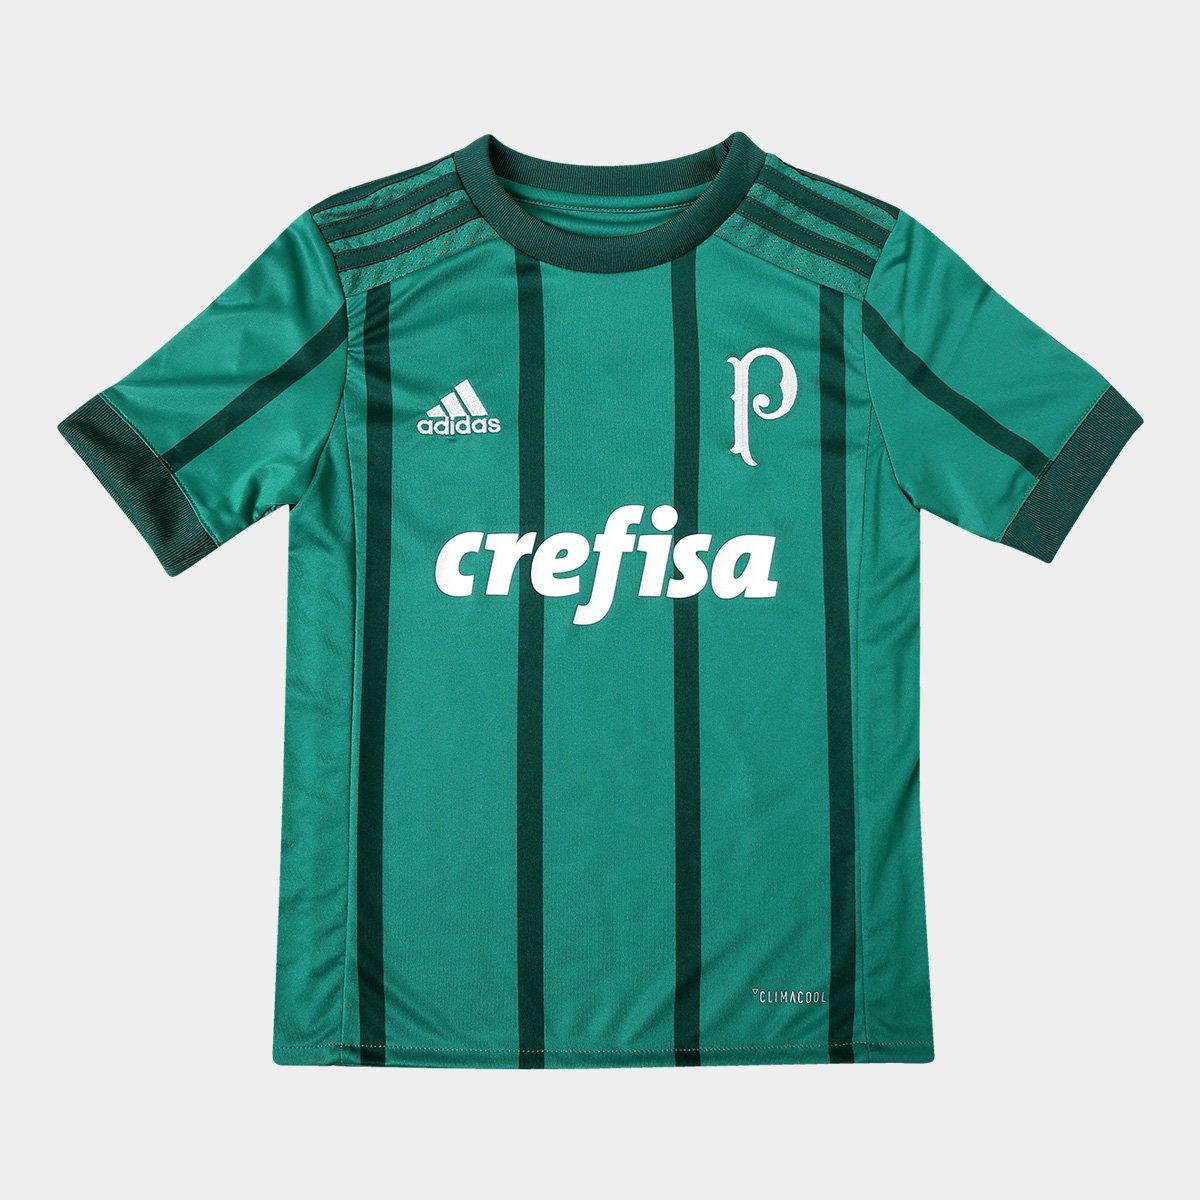 Camisa Palmeiras Infantil I 17 18 s nº Torcedor Adidas - Verde ... a135664049c0d